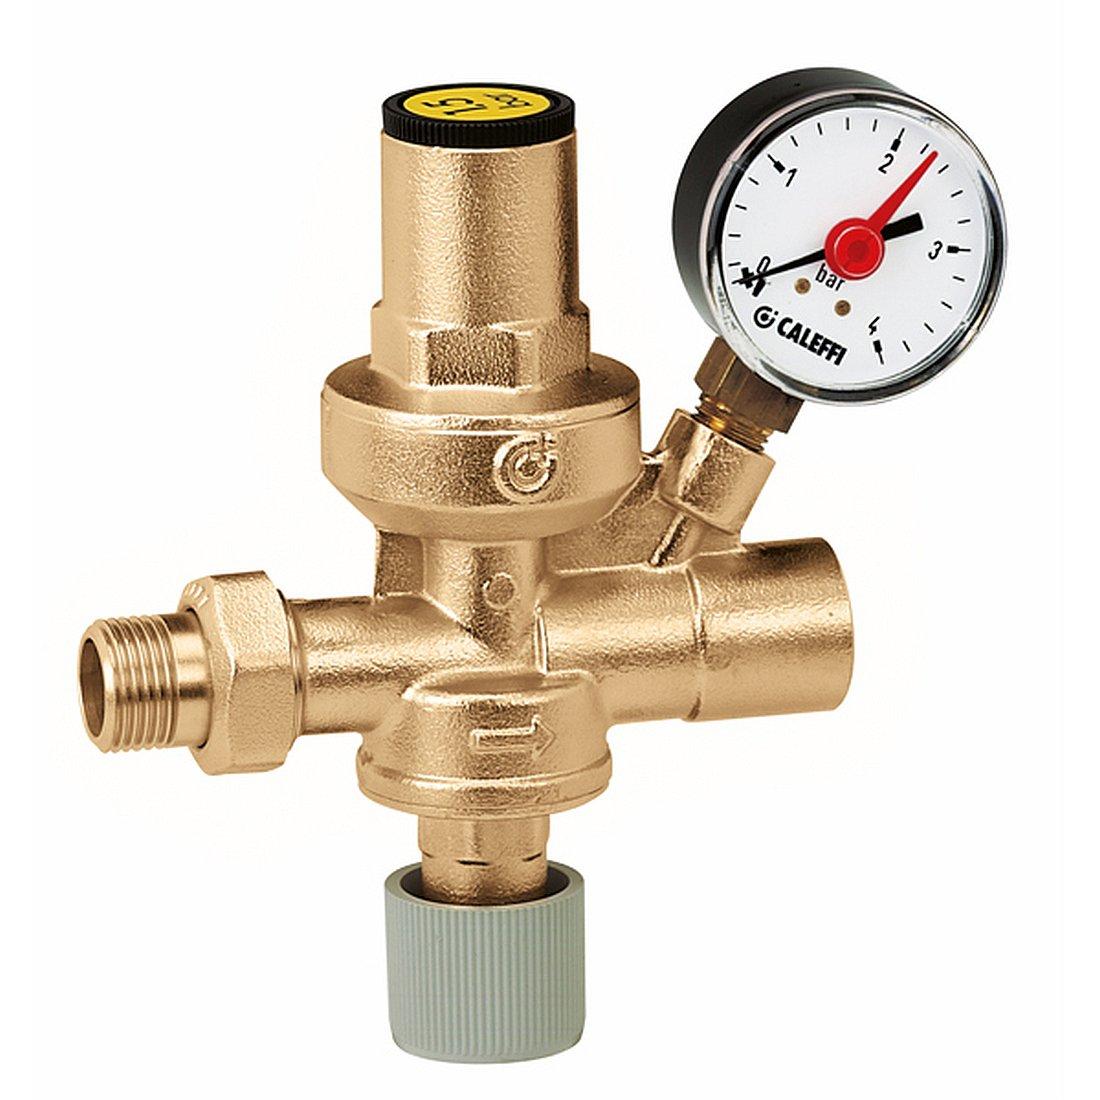 "Caleffi Automatic Filling Unit 1/2"" with Pressure Gauge 553140"